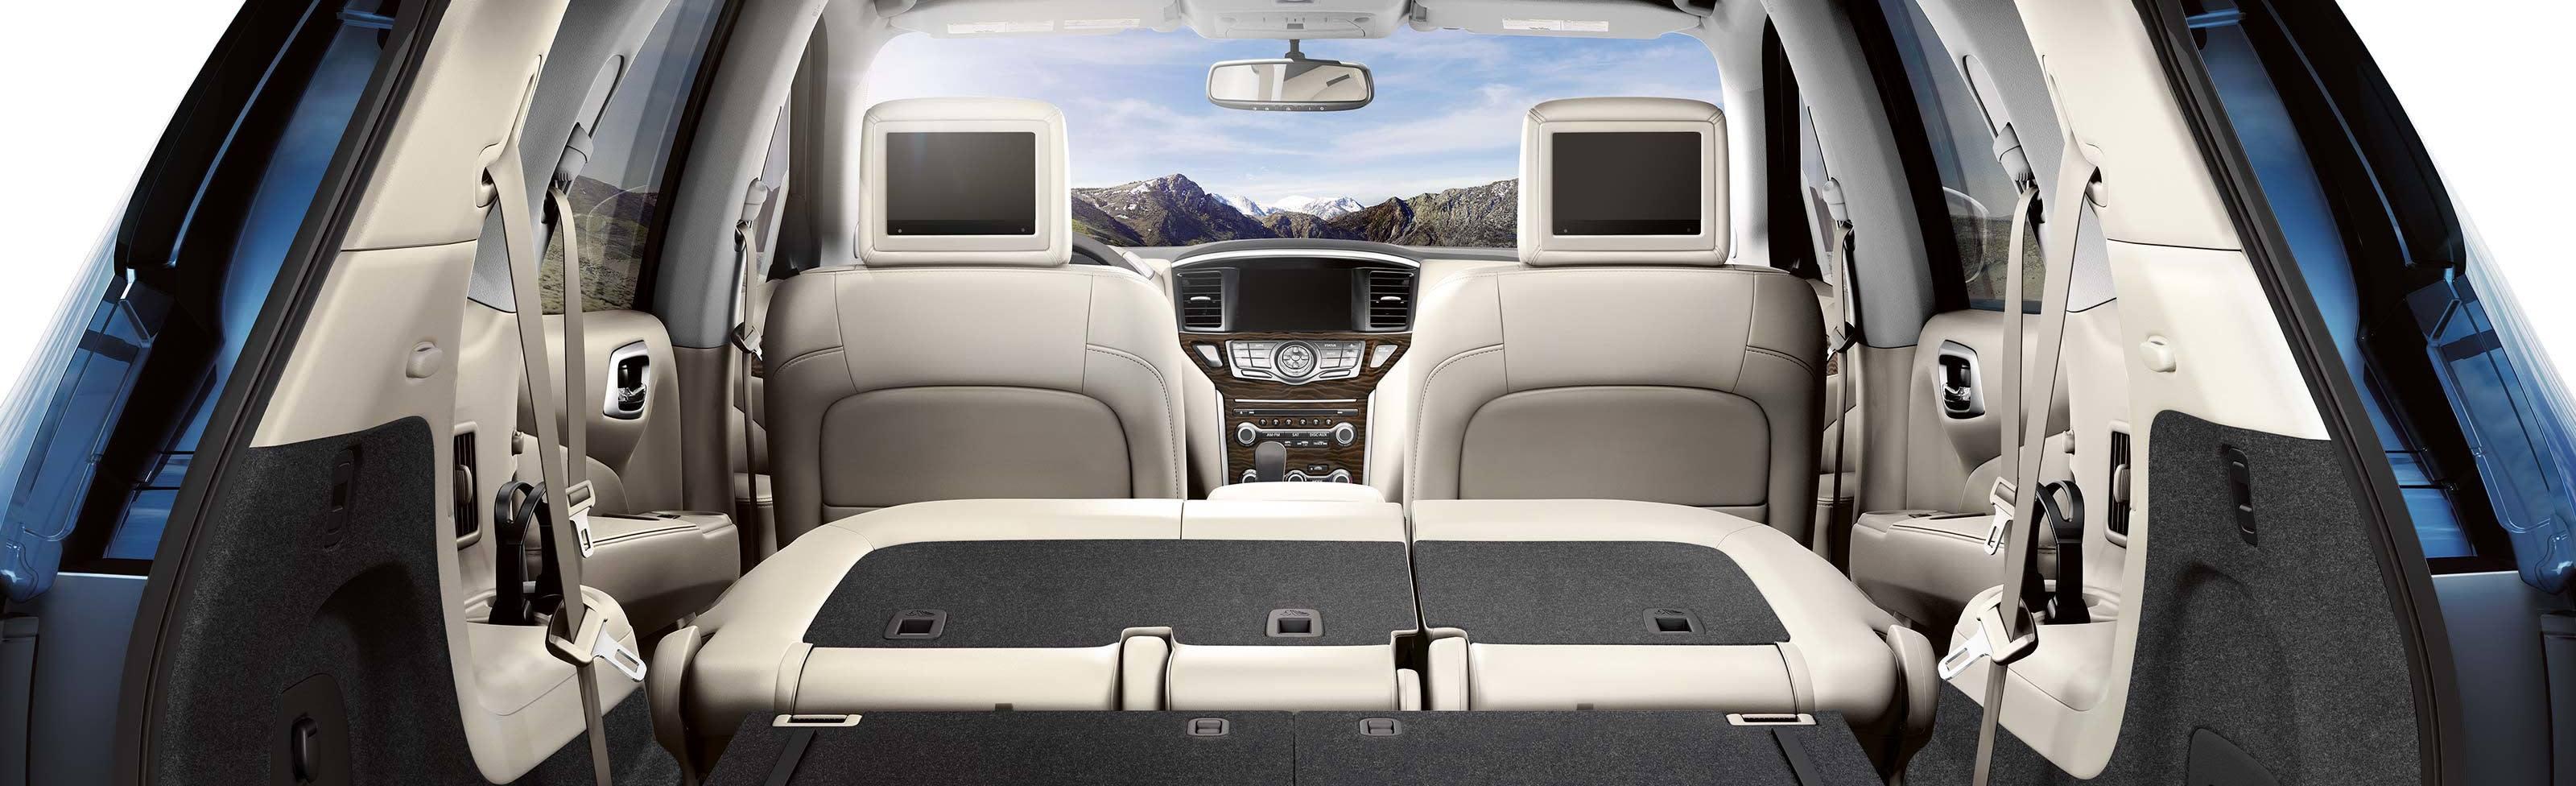 Cargo Room in the 2019 Nissan Pathfinder